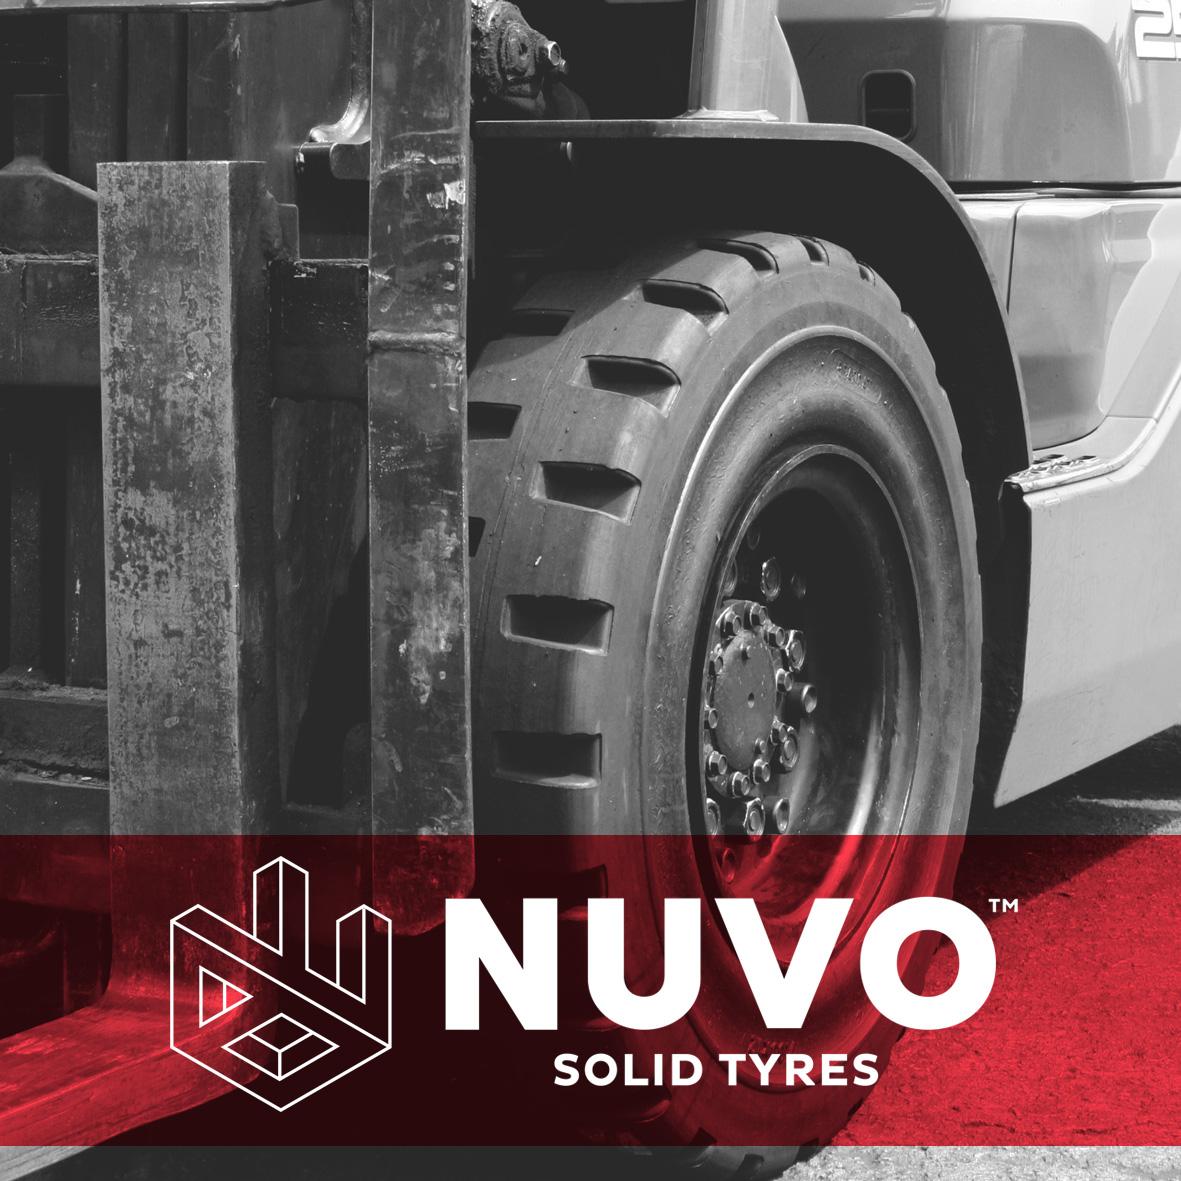 nuvo logos_solid tyres.jpg